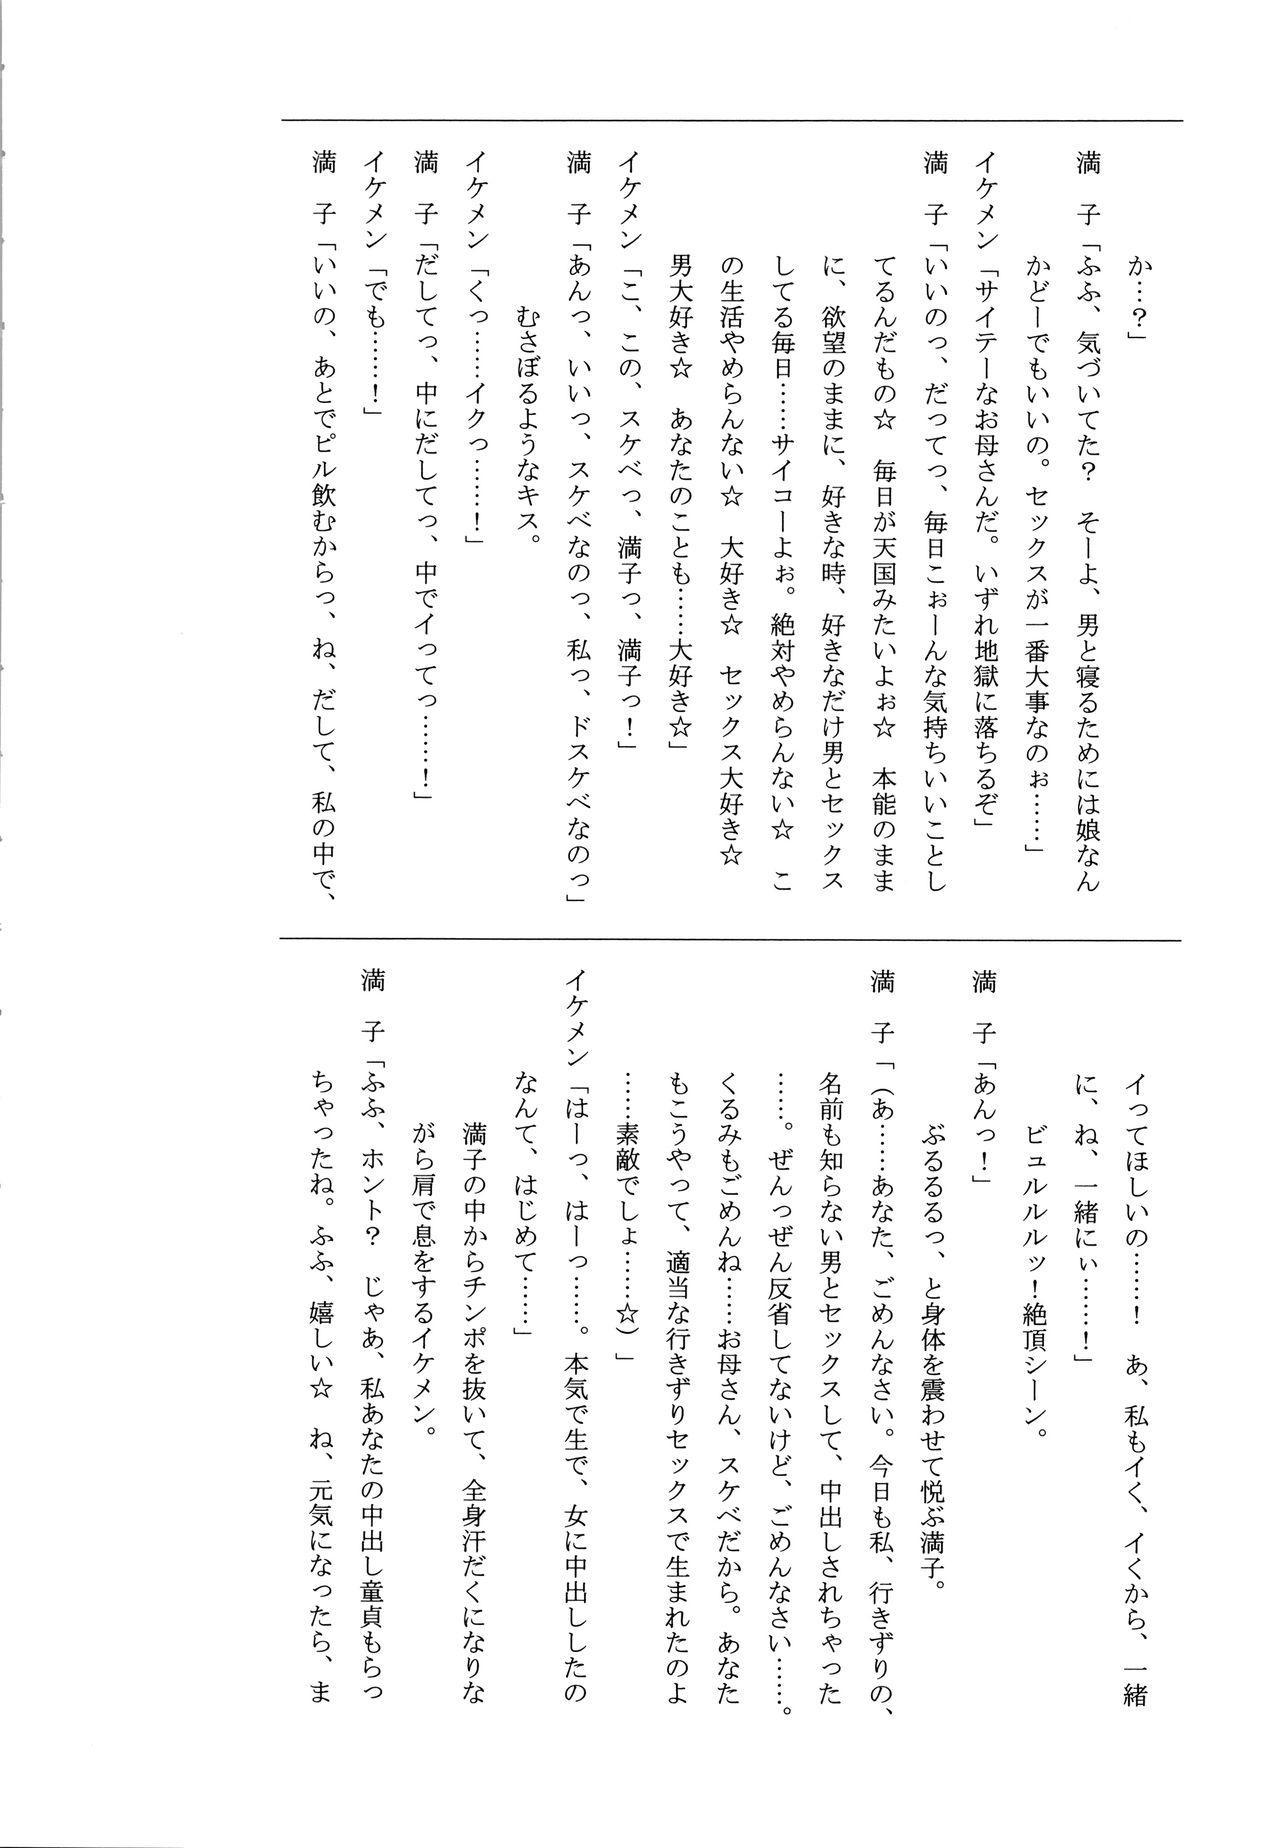 Teisou Kannen ZERO Shinsouban 1 193